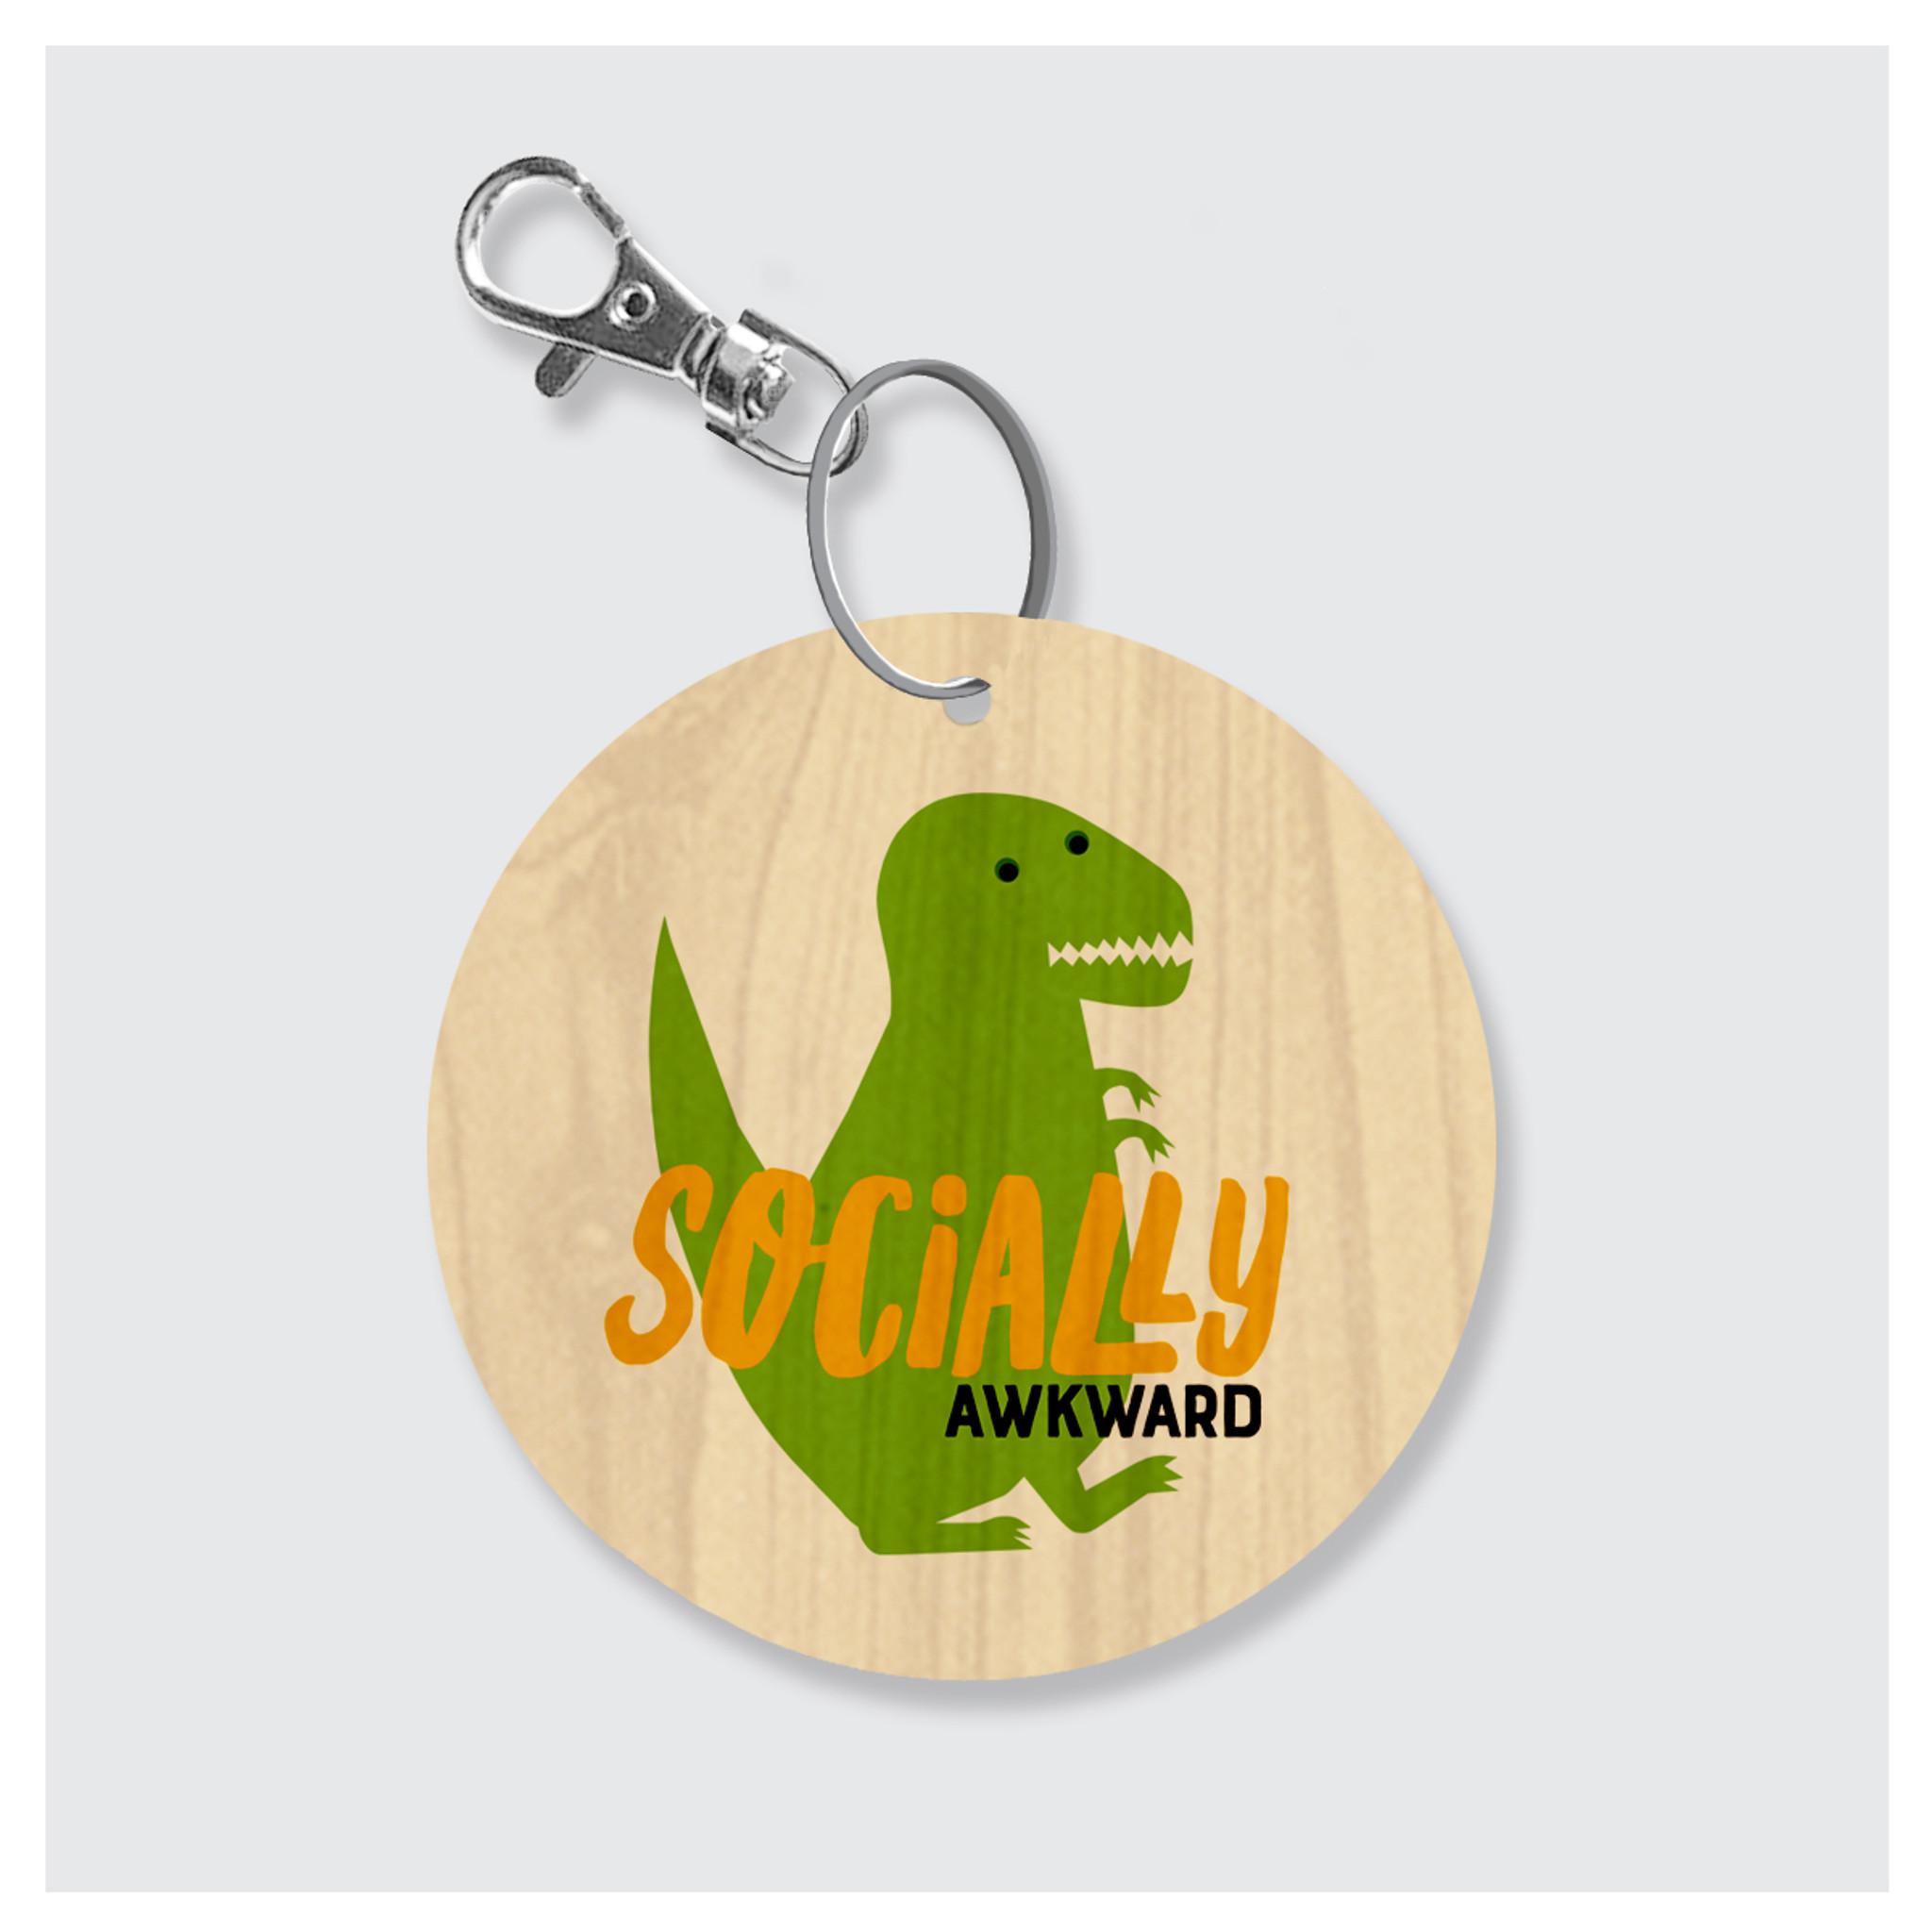 Socially Awkward Keychain